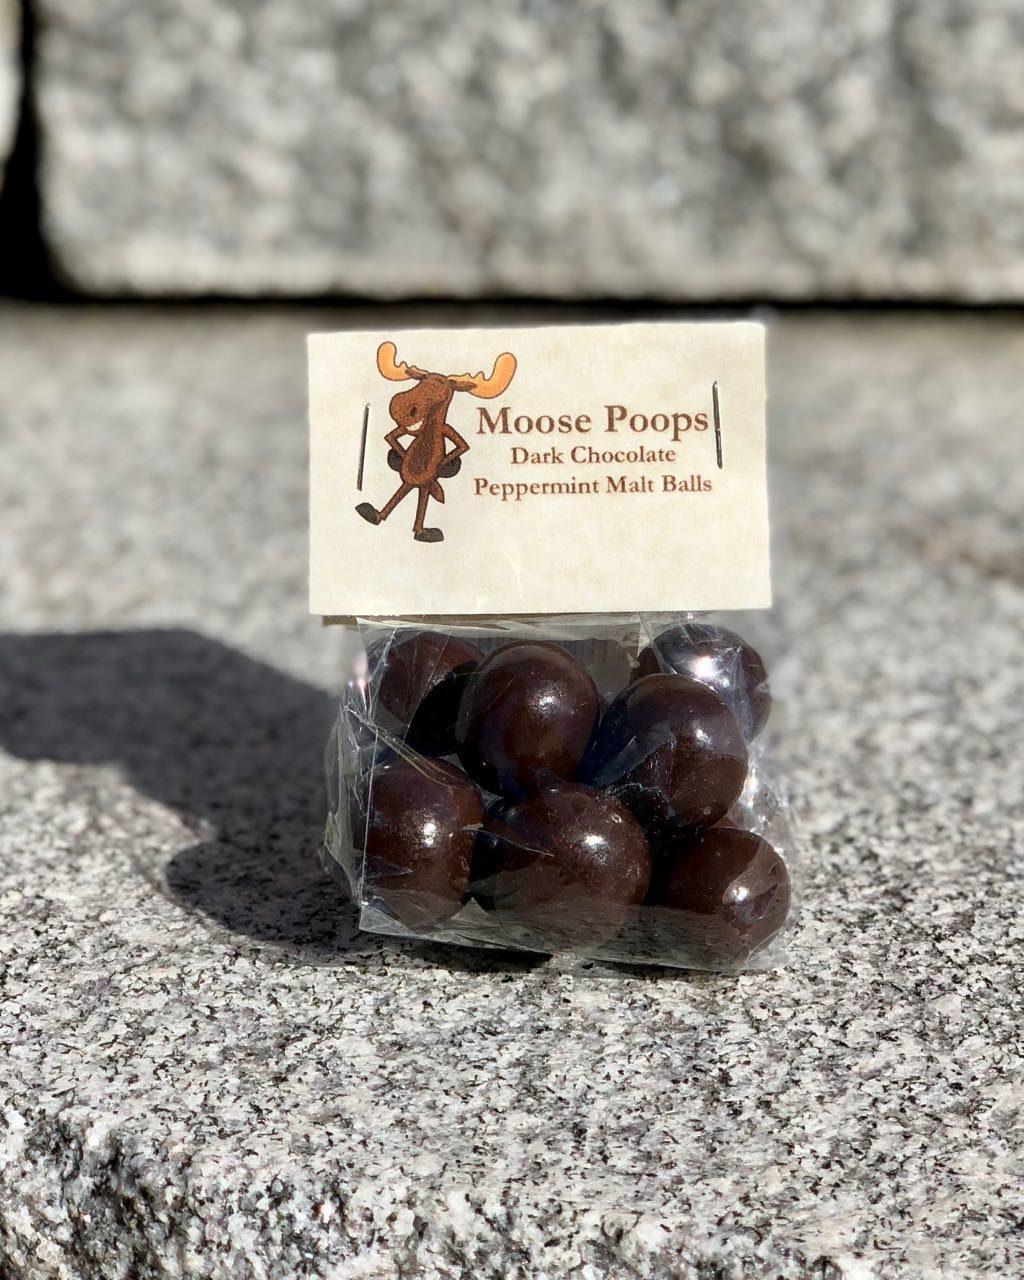 Moose Poop Candy - Dark Chocolate Peppermint Malt Balls